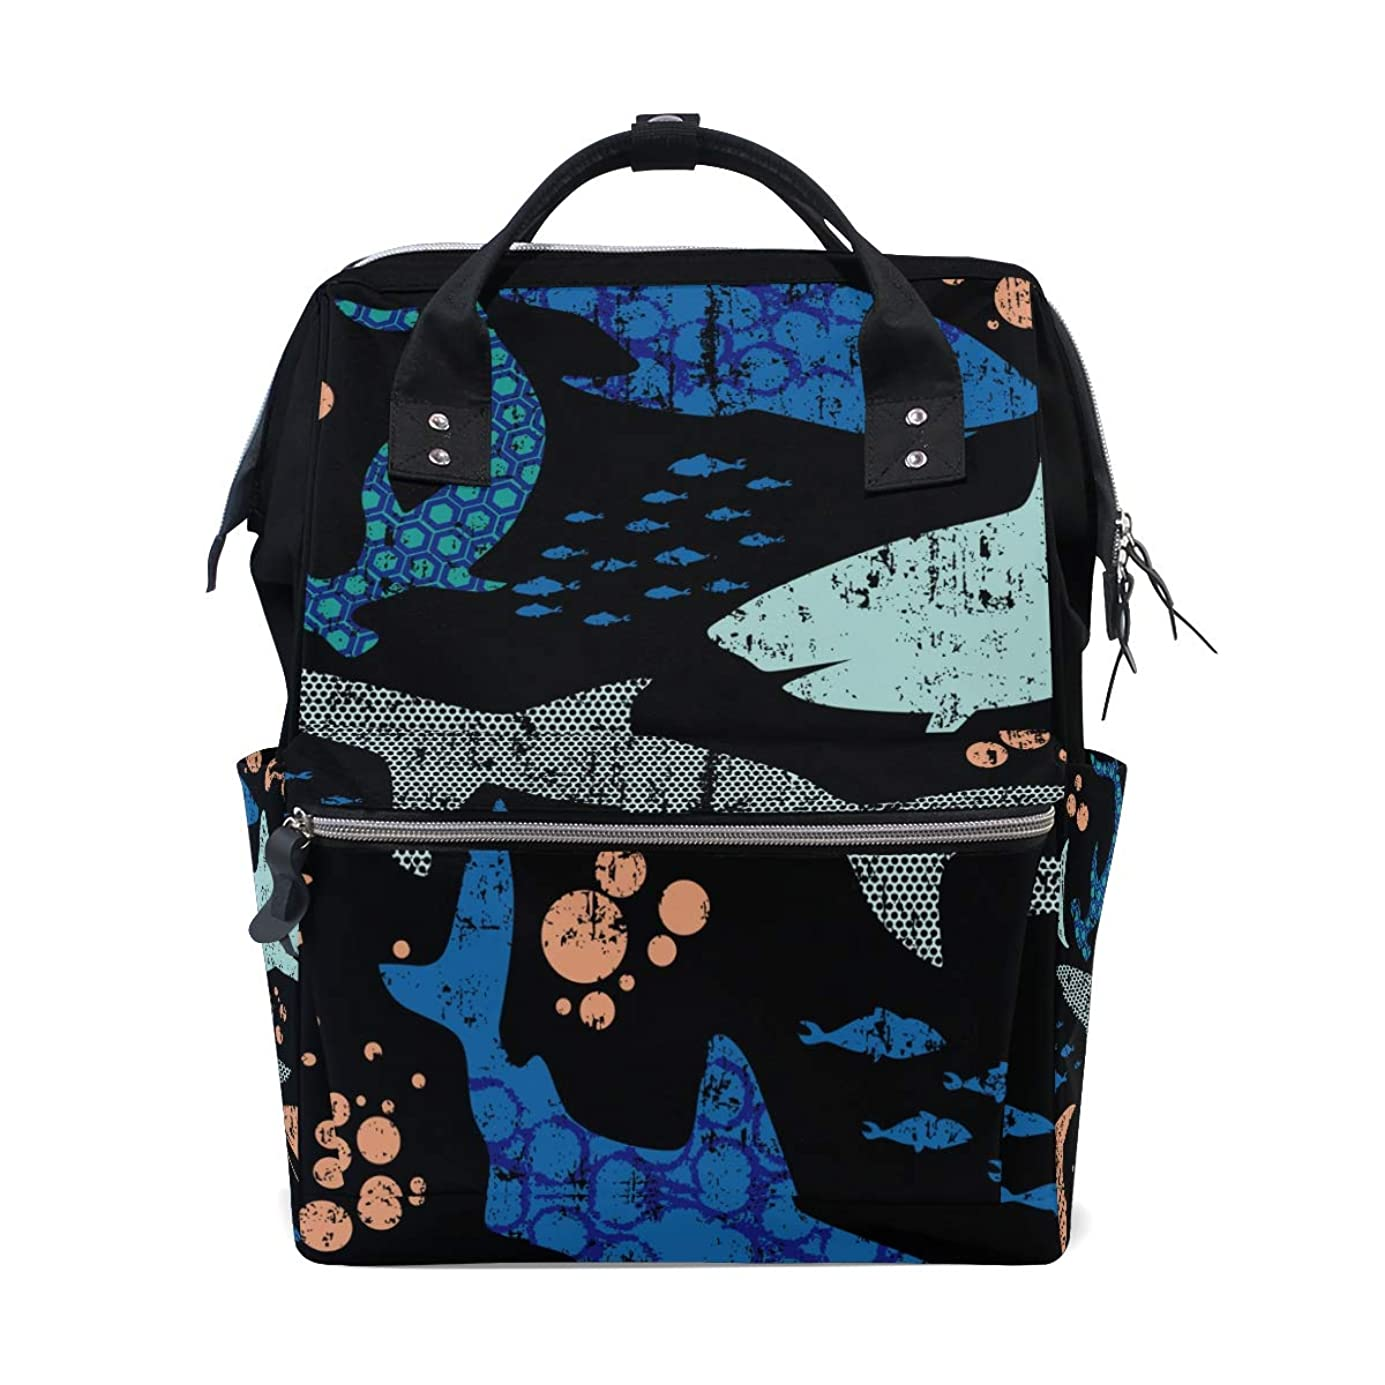 Sharks Fishes School Backpack Large Capacity Mummy Bags Laptop Handbag Casual Travel Rucksack Satchel For Women Men Adult Teen Children ocewwf3113